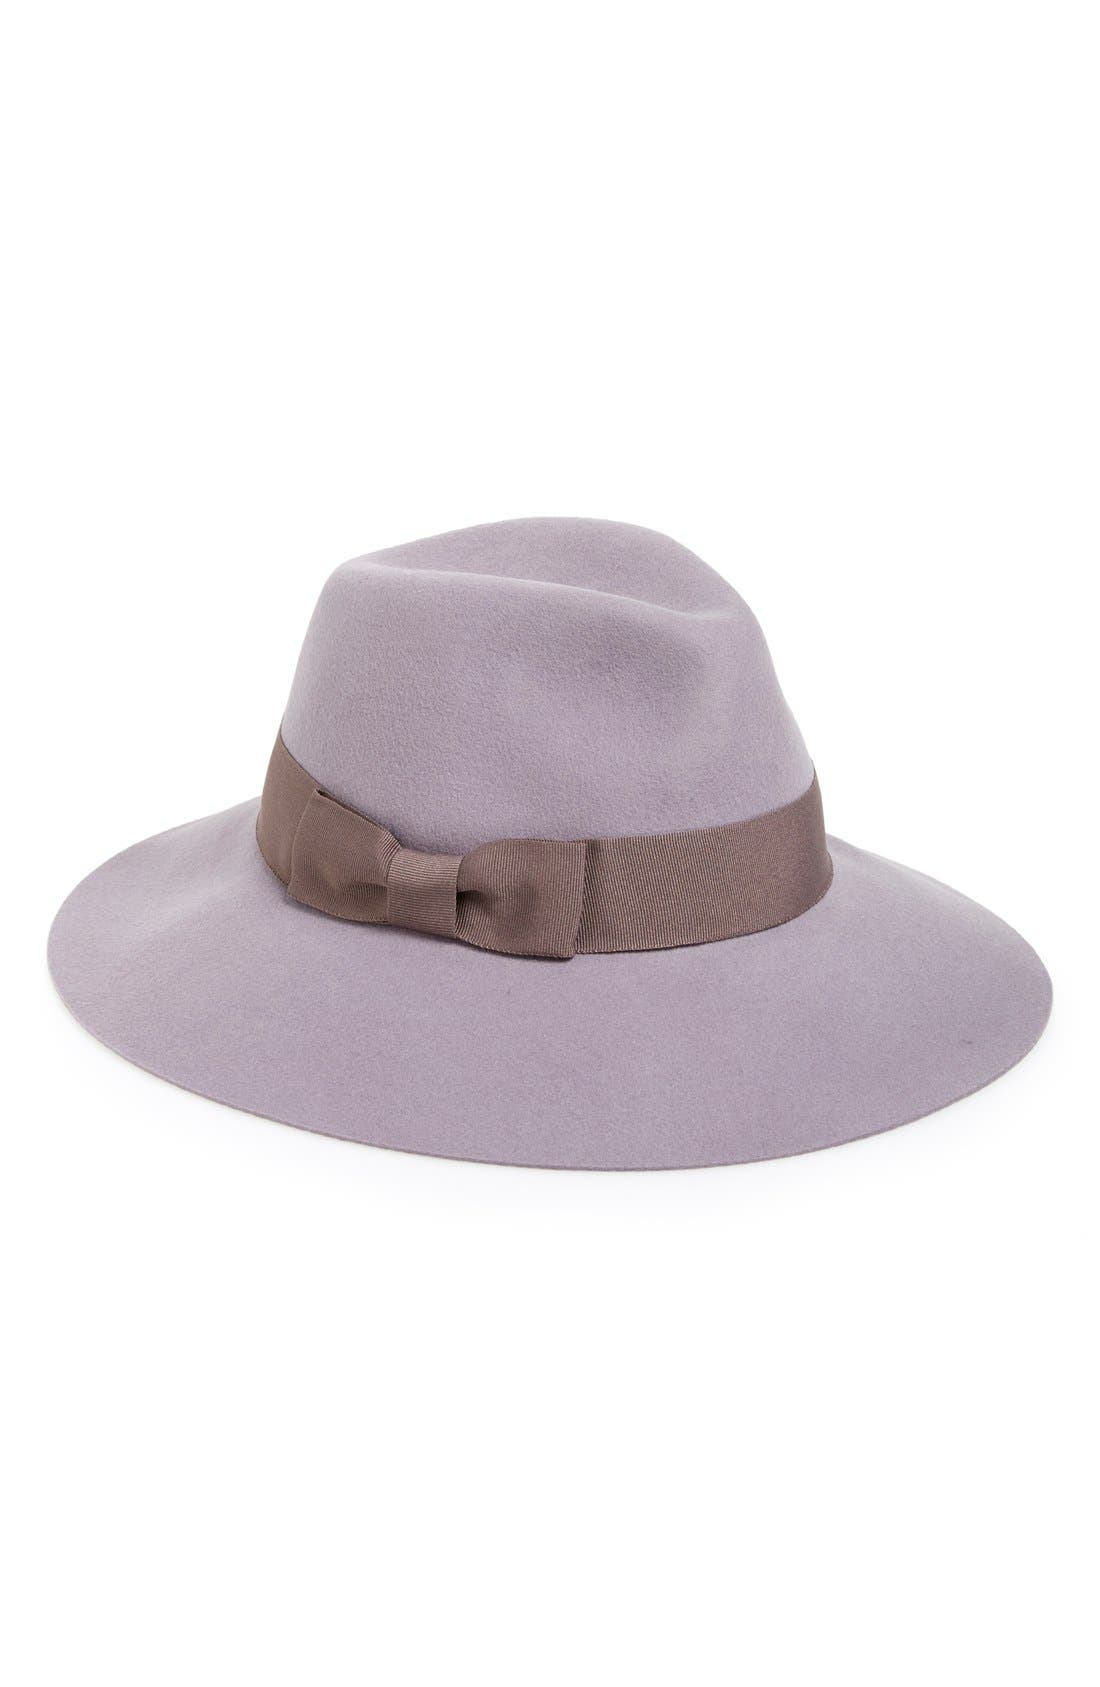 Main Image - August Hat Pastel Wool Fedora